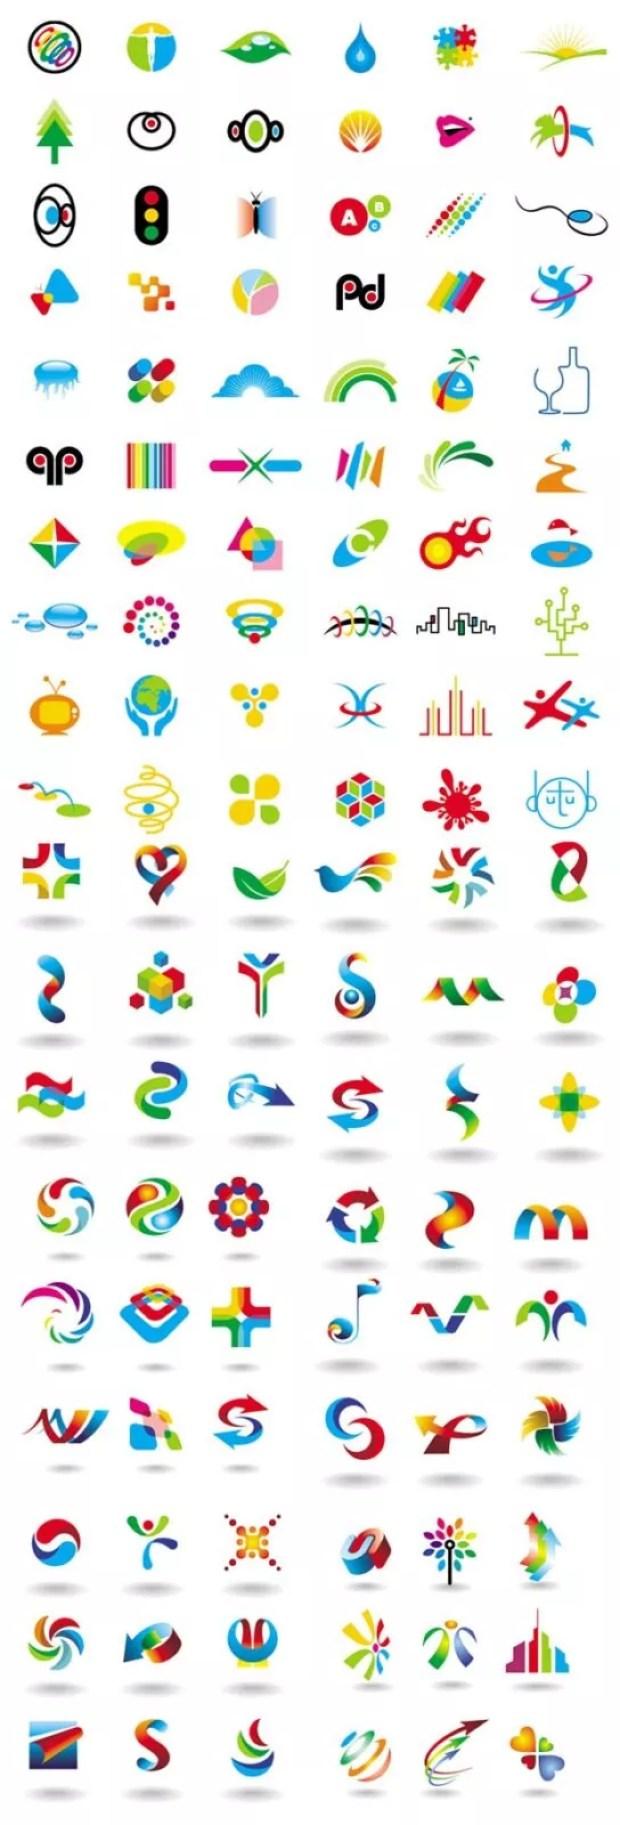 webcolorele large vectorgab - 100+ Web Design Elements For Free